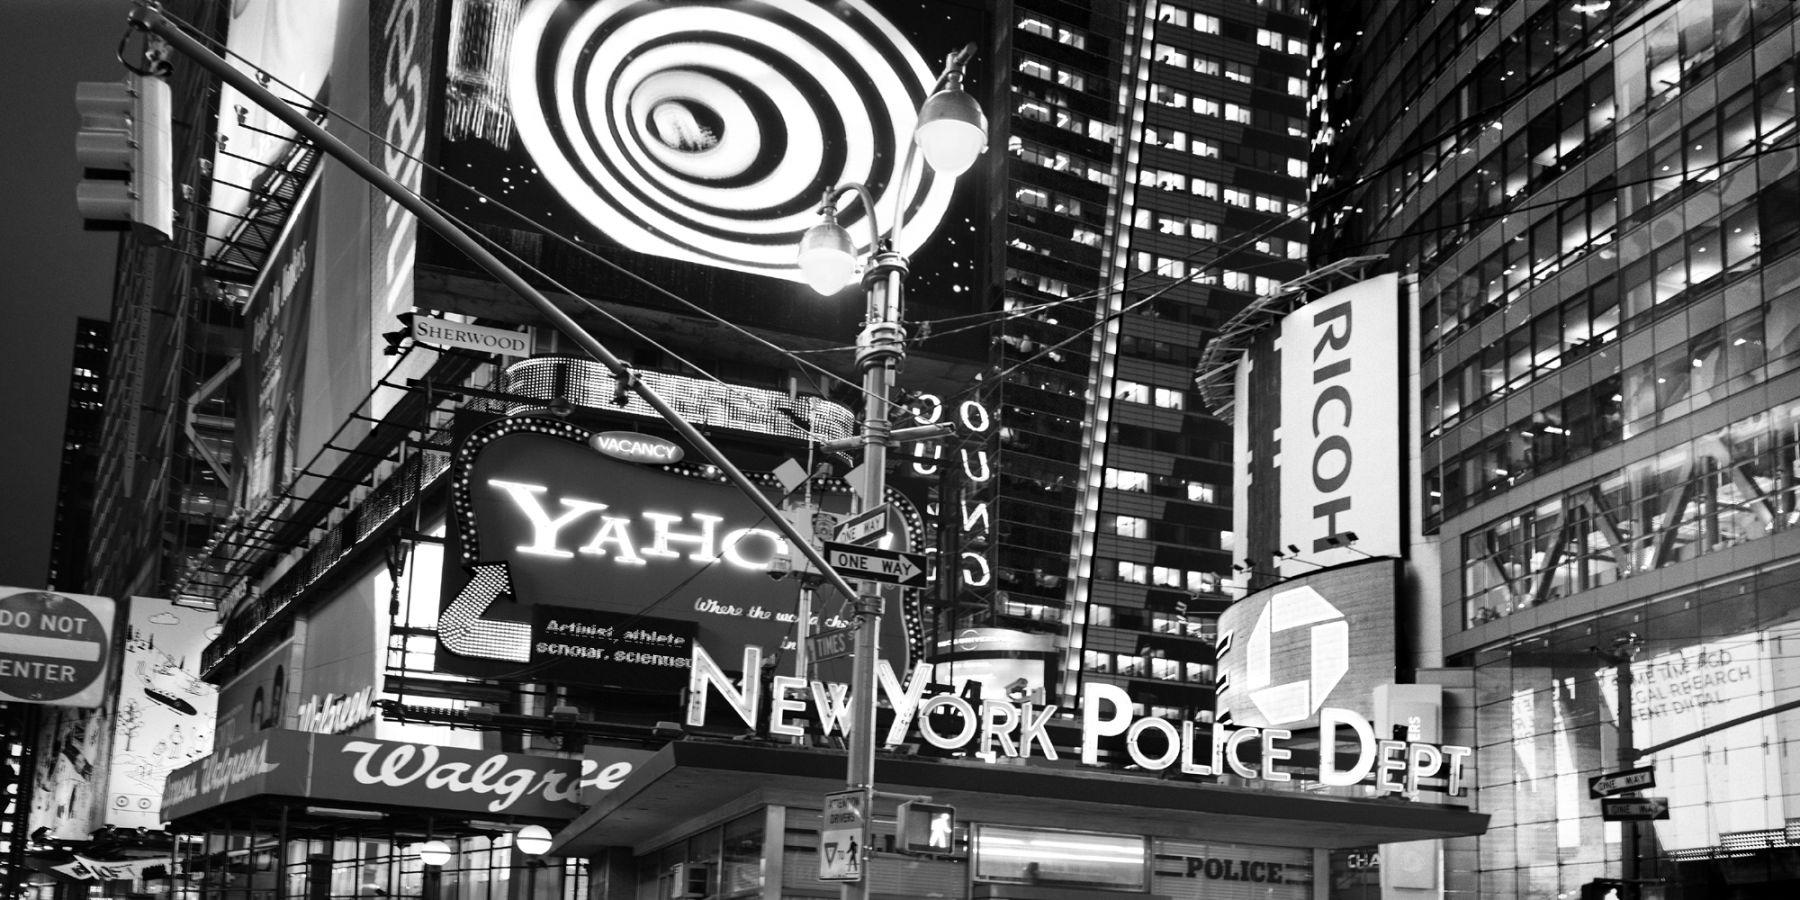 Leo Rubinfien, In Times Square